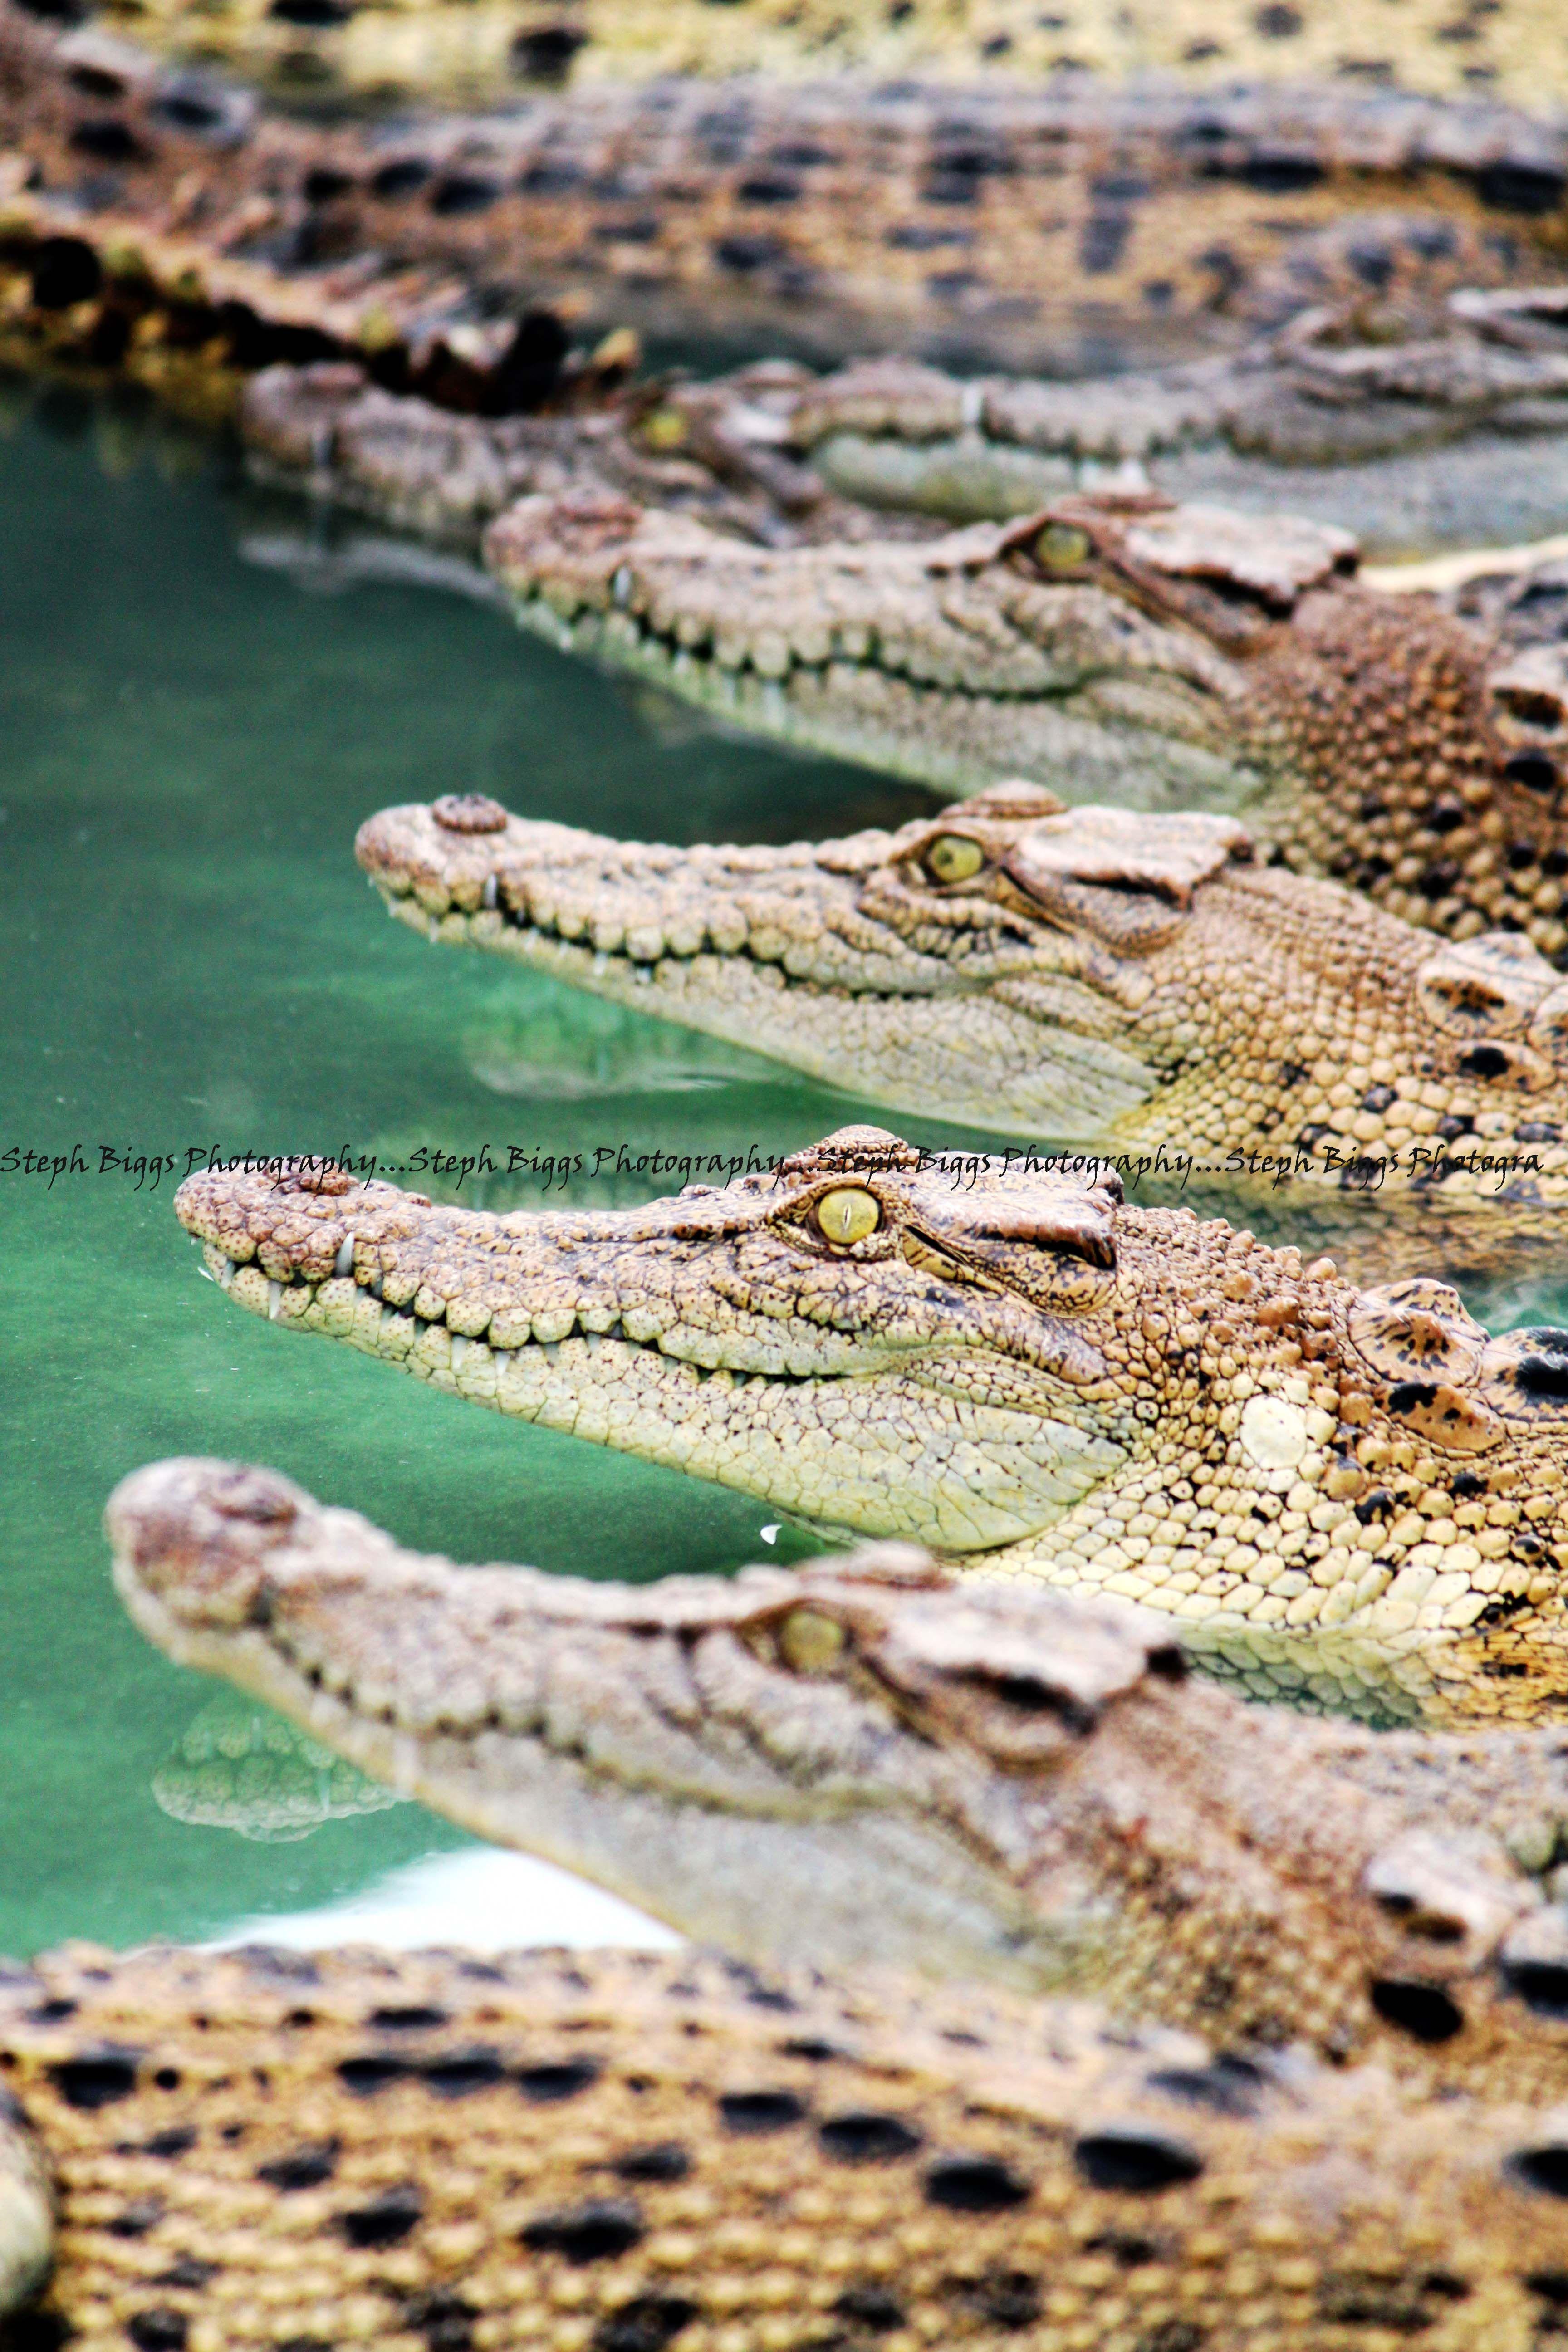 Crocodile farm, Queensland